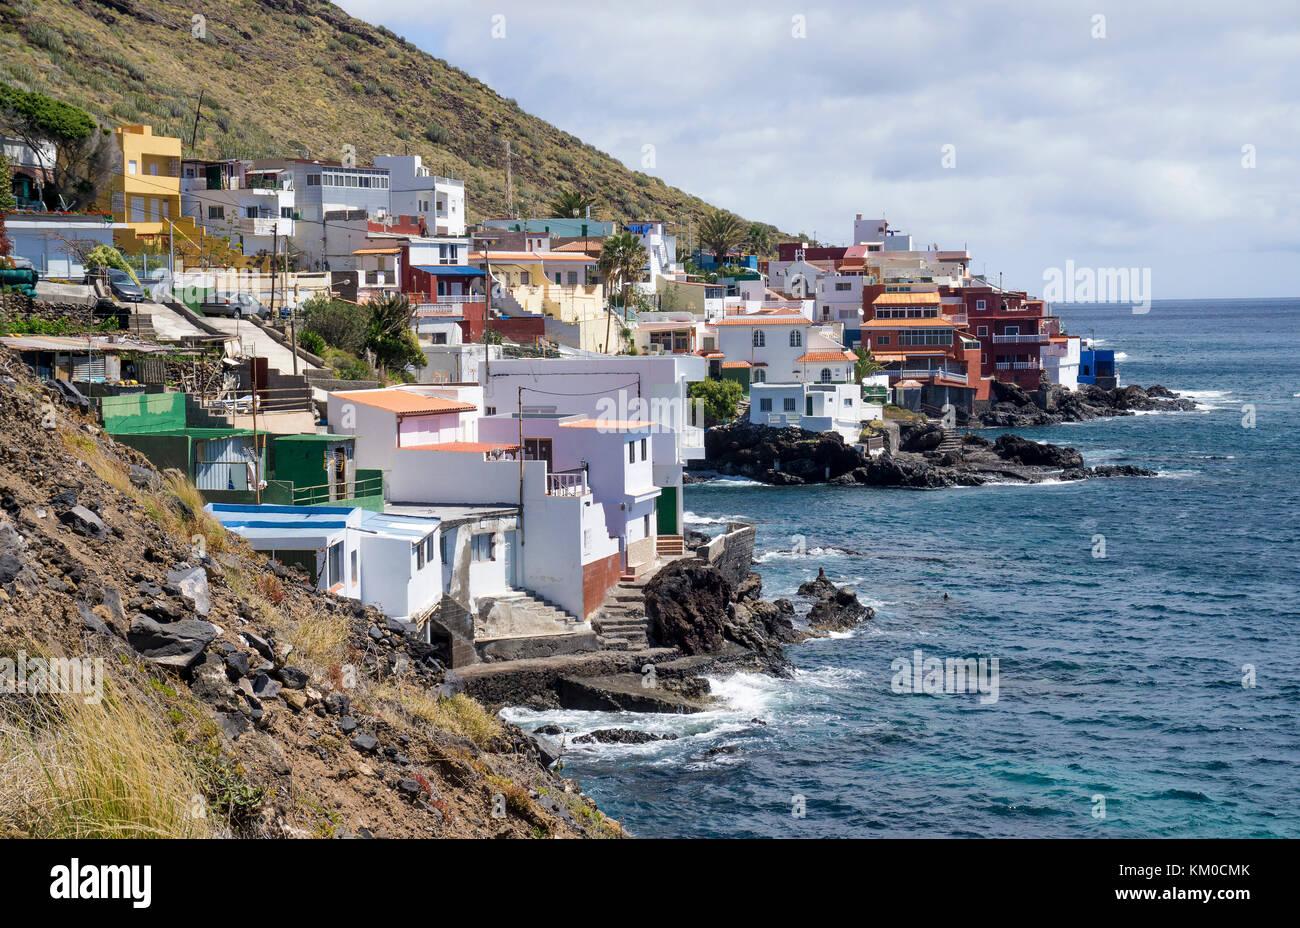 The tiny fishing village Boca Cangrejo south-east of Tenerife island, Canary islands, Spain - Stock Image